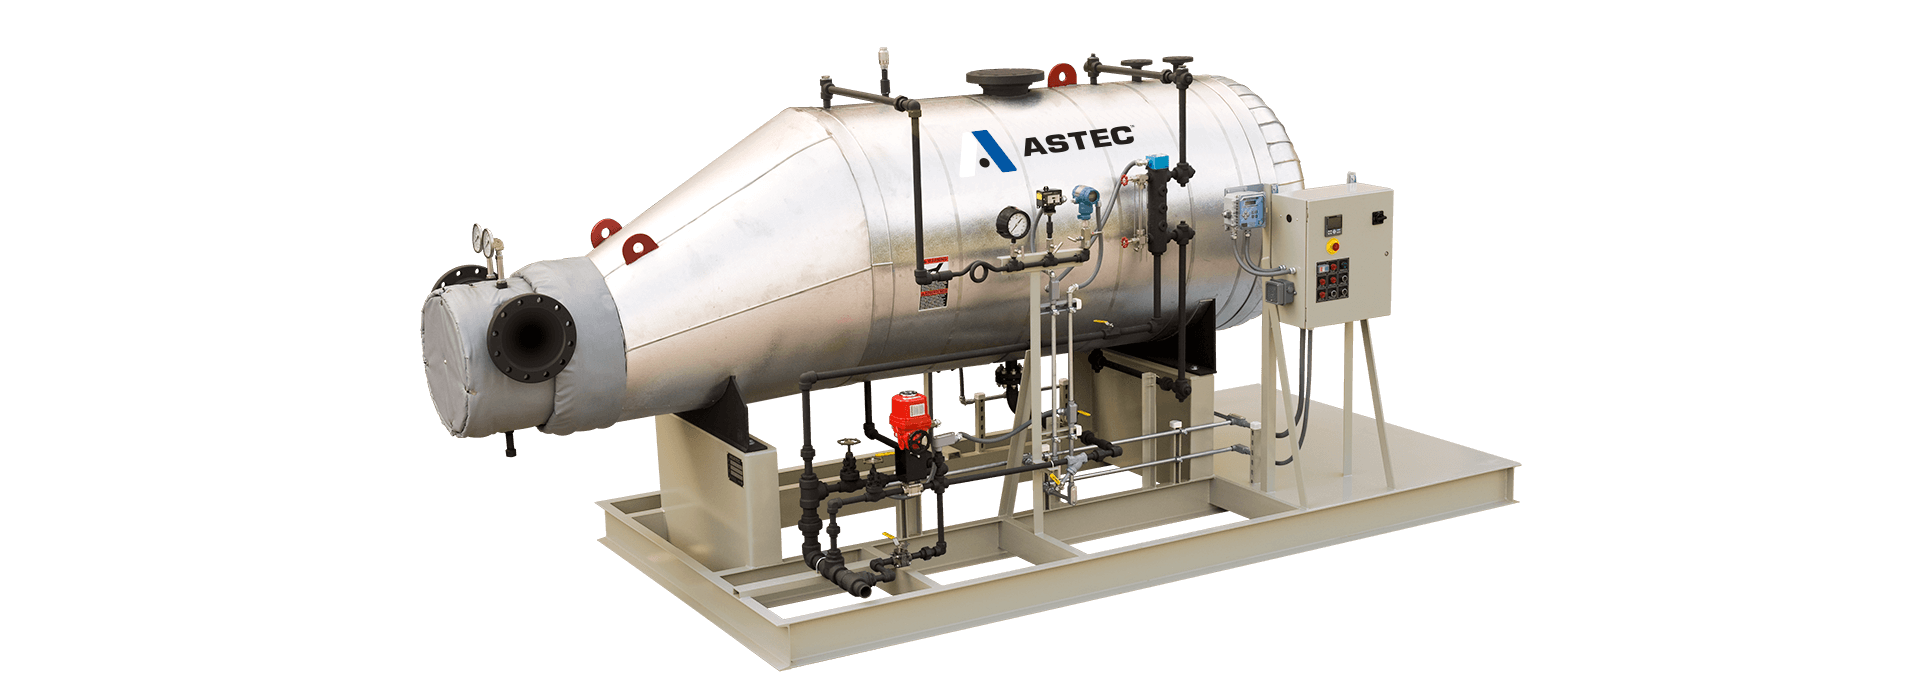 Heatec Steam Generator